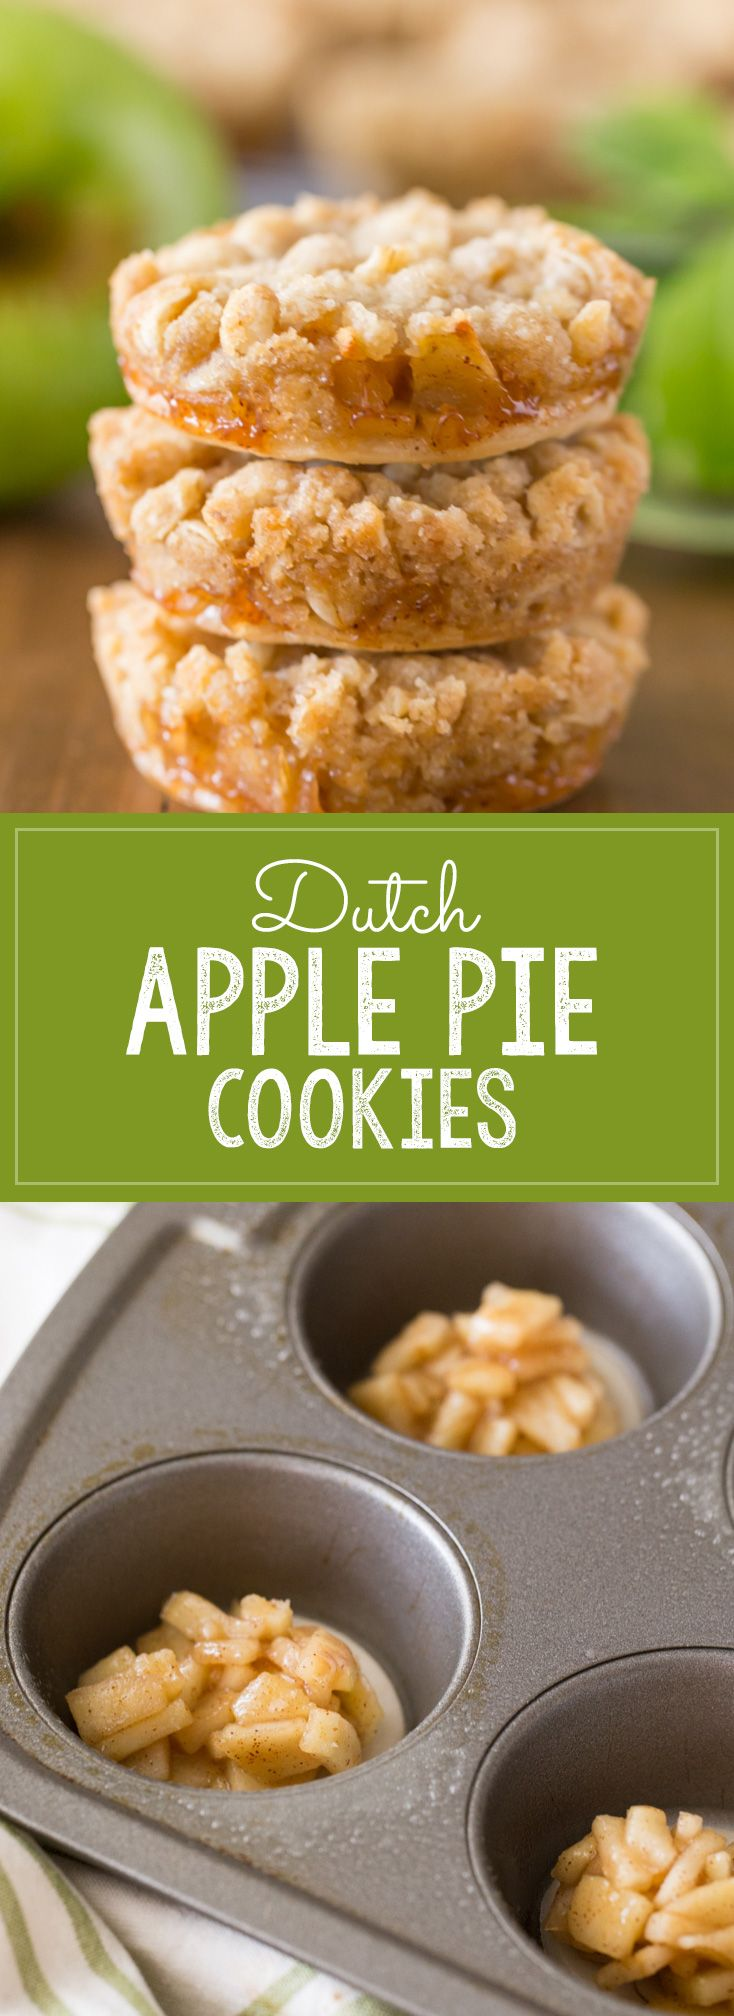 Dutch Apple Pie Cookies – The perfect little three bite dessert with a flakey pie